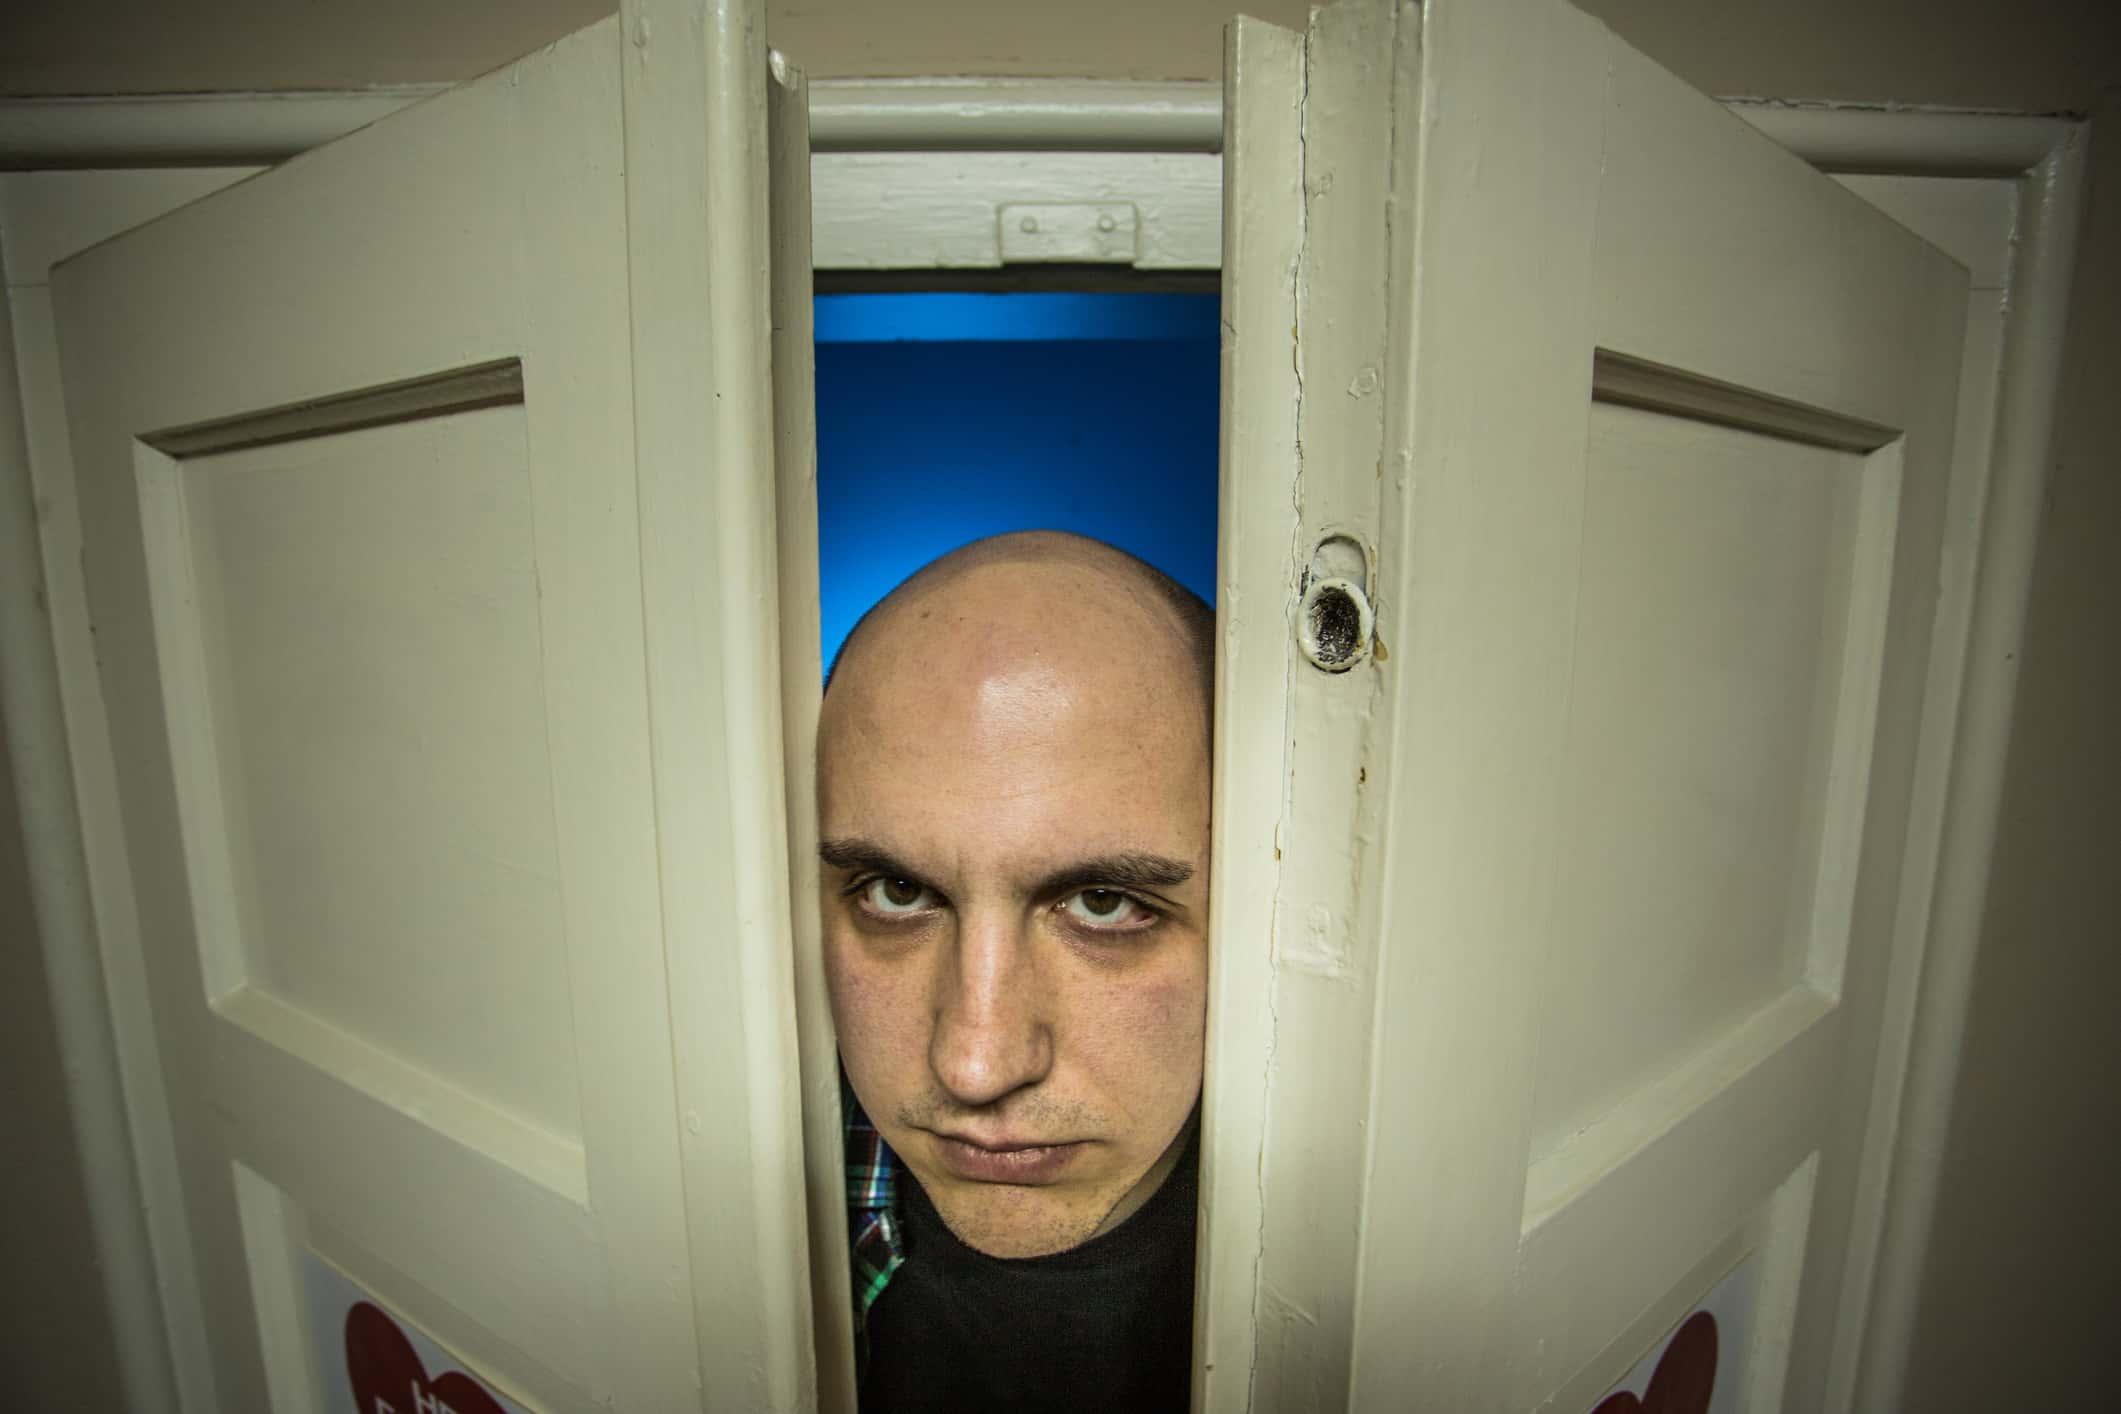 Creepy bald Man Staring At Camera through the door